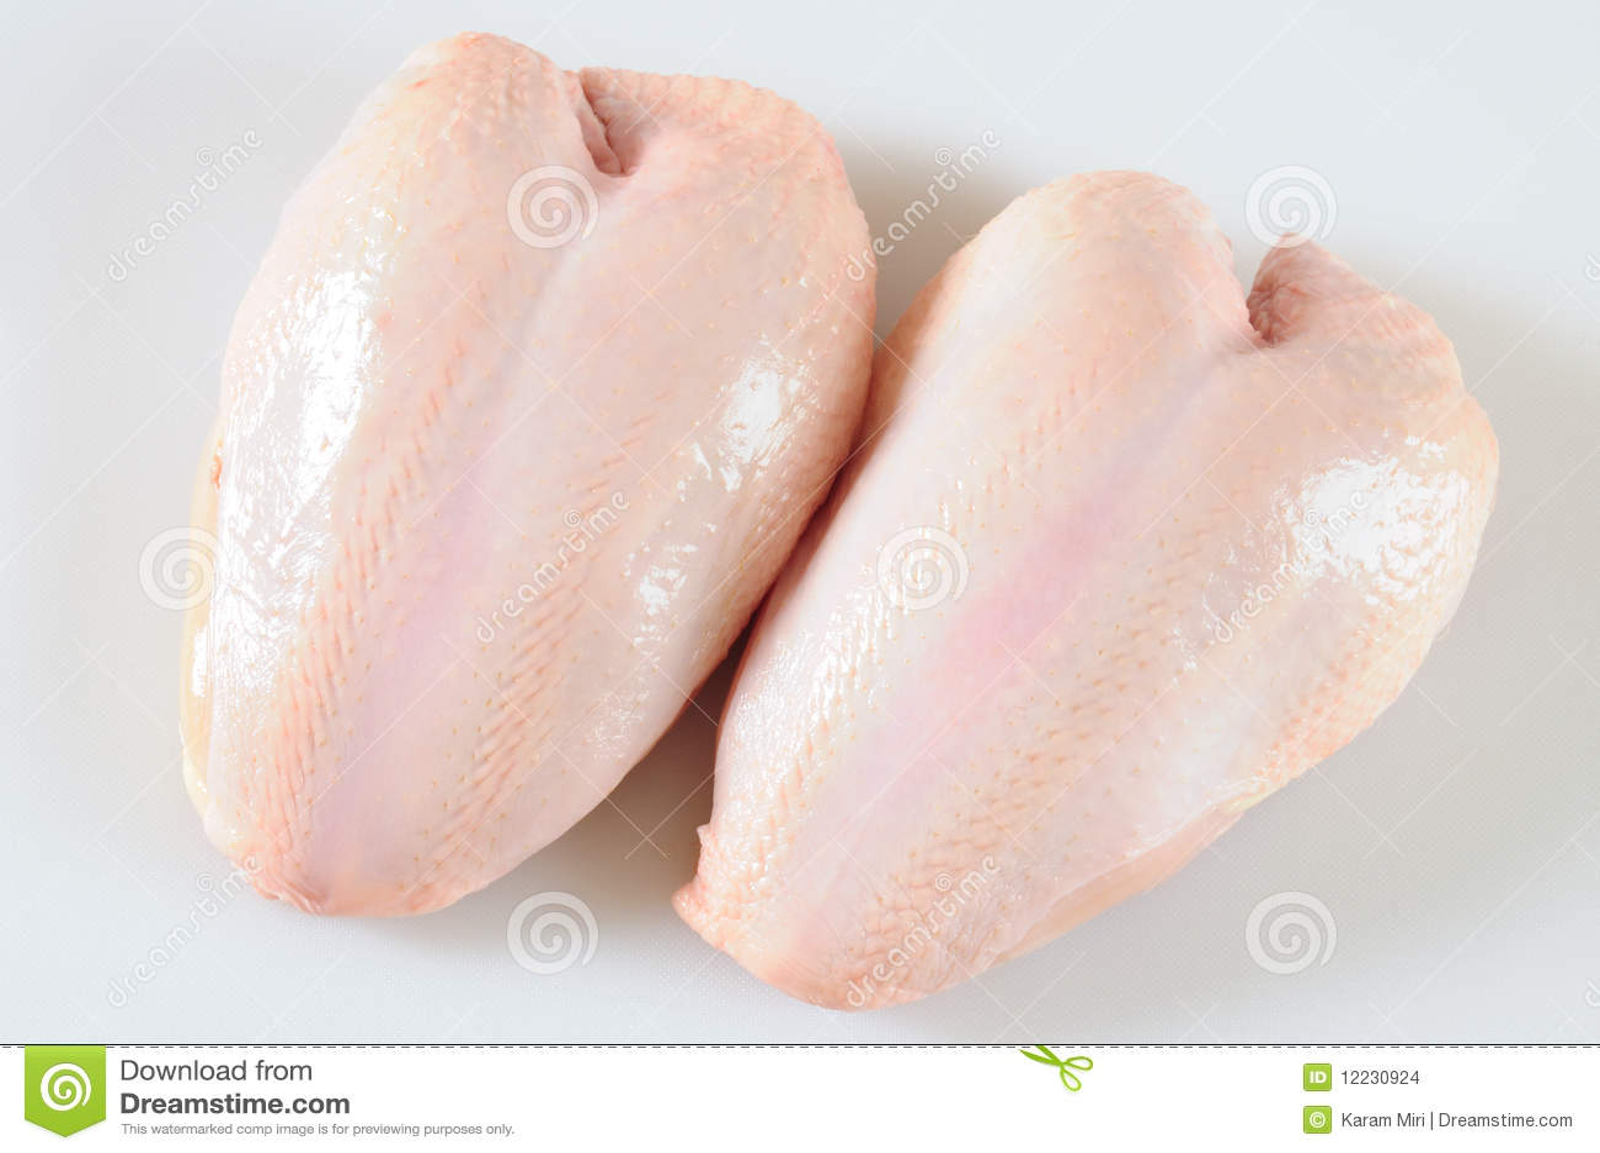 Breast Breasts Chicken Fresh Skin Two